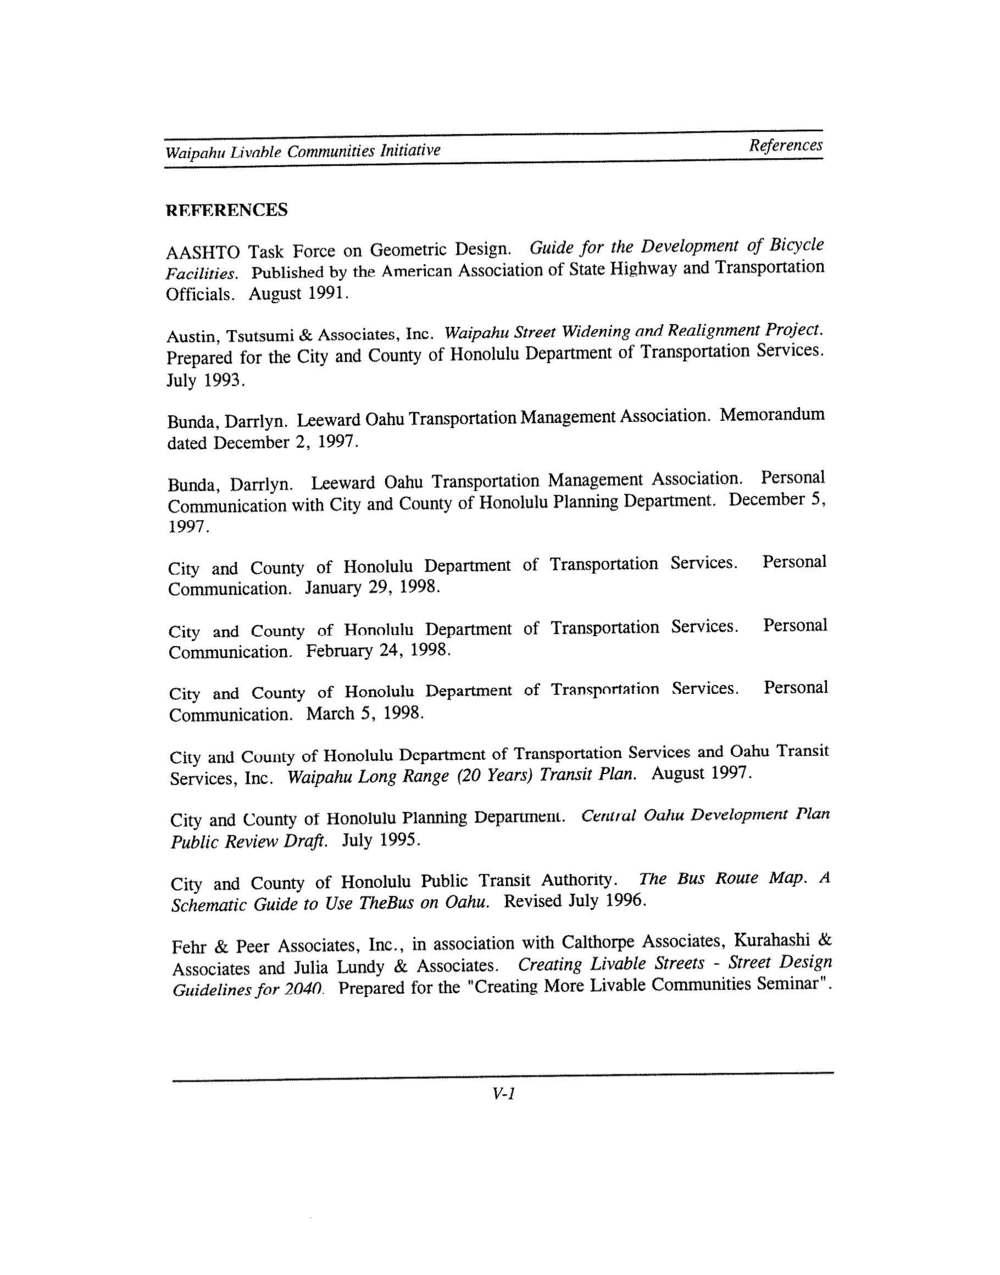 160531_WaipahuLivableCommunities(1998)_Page_154.jpg